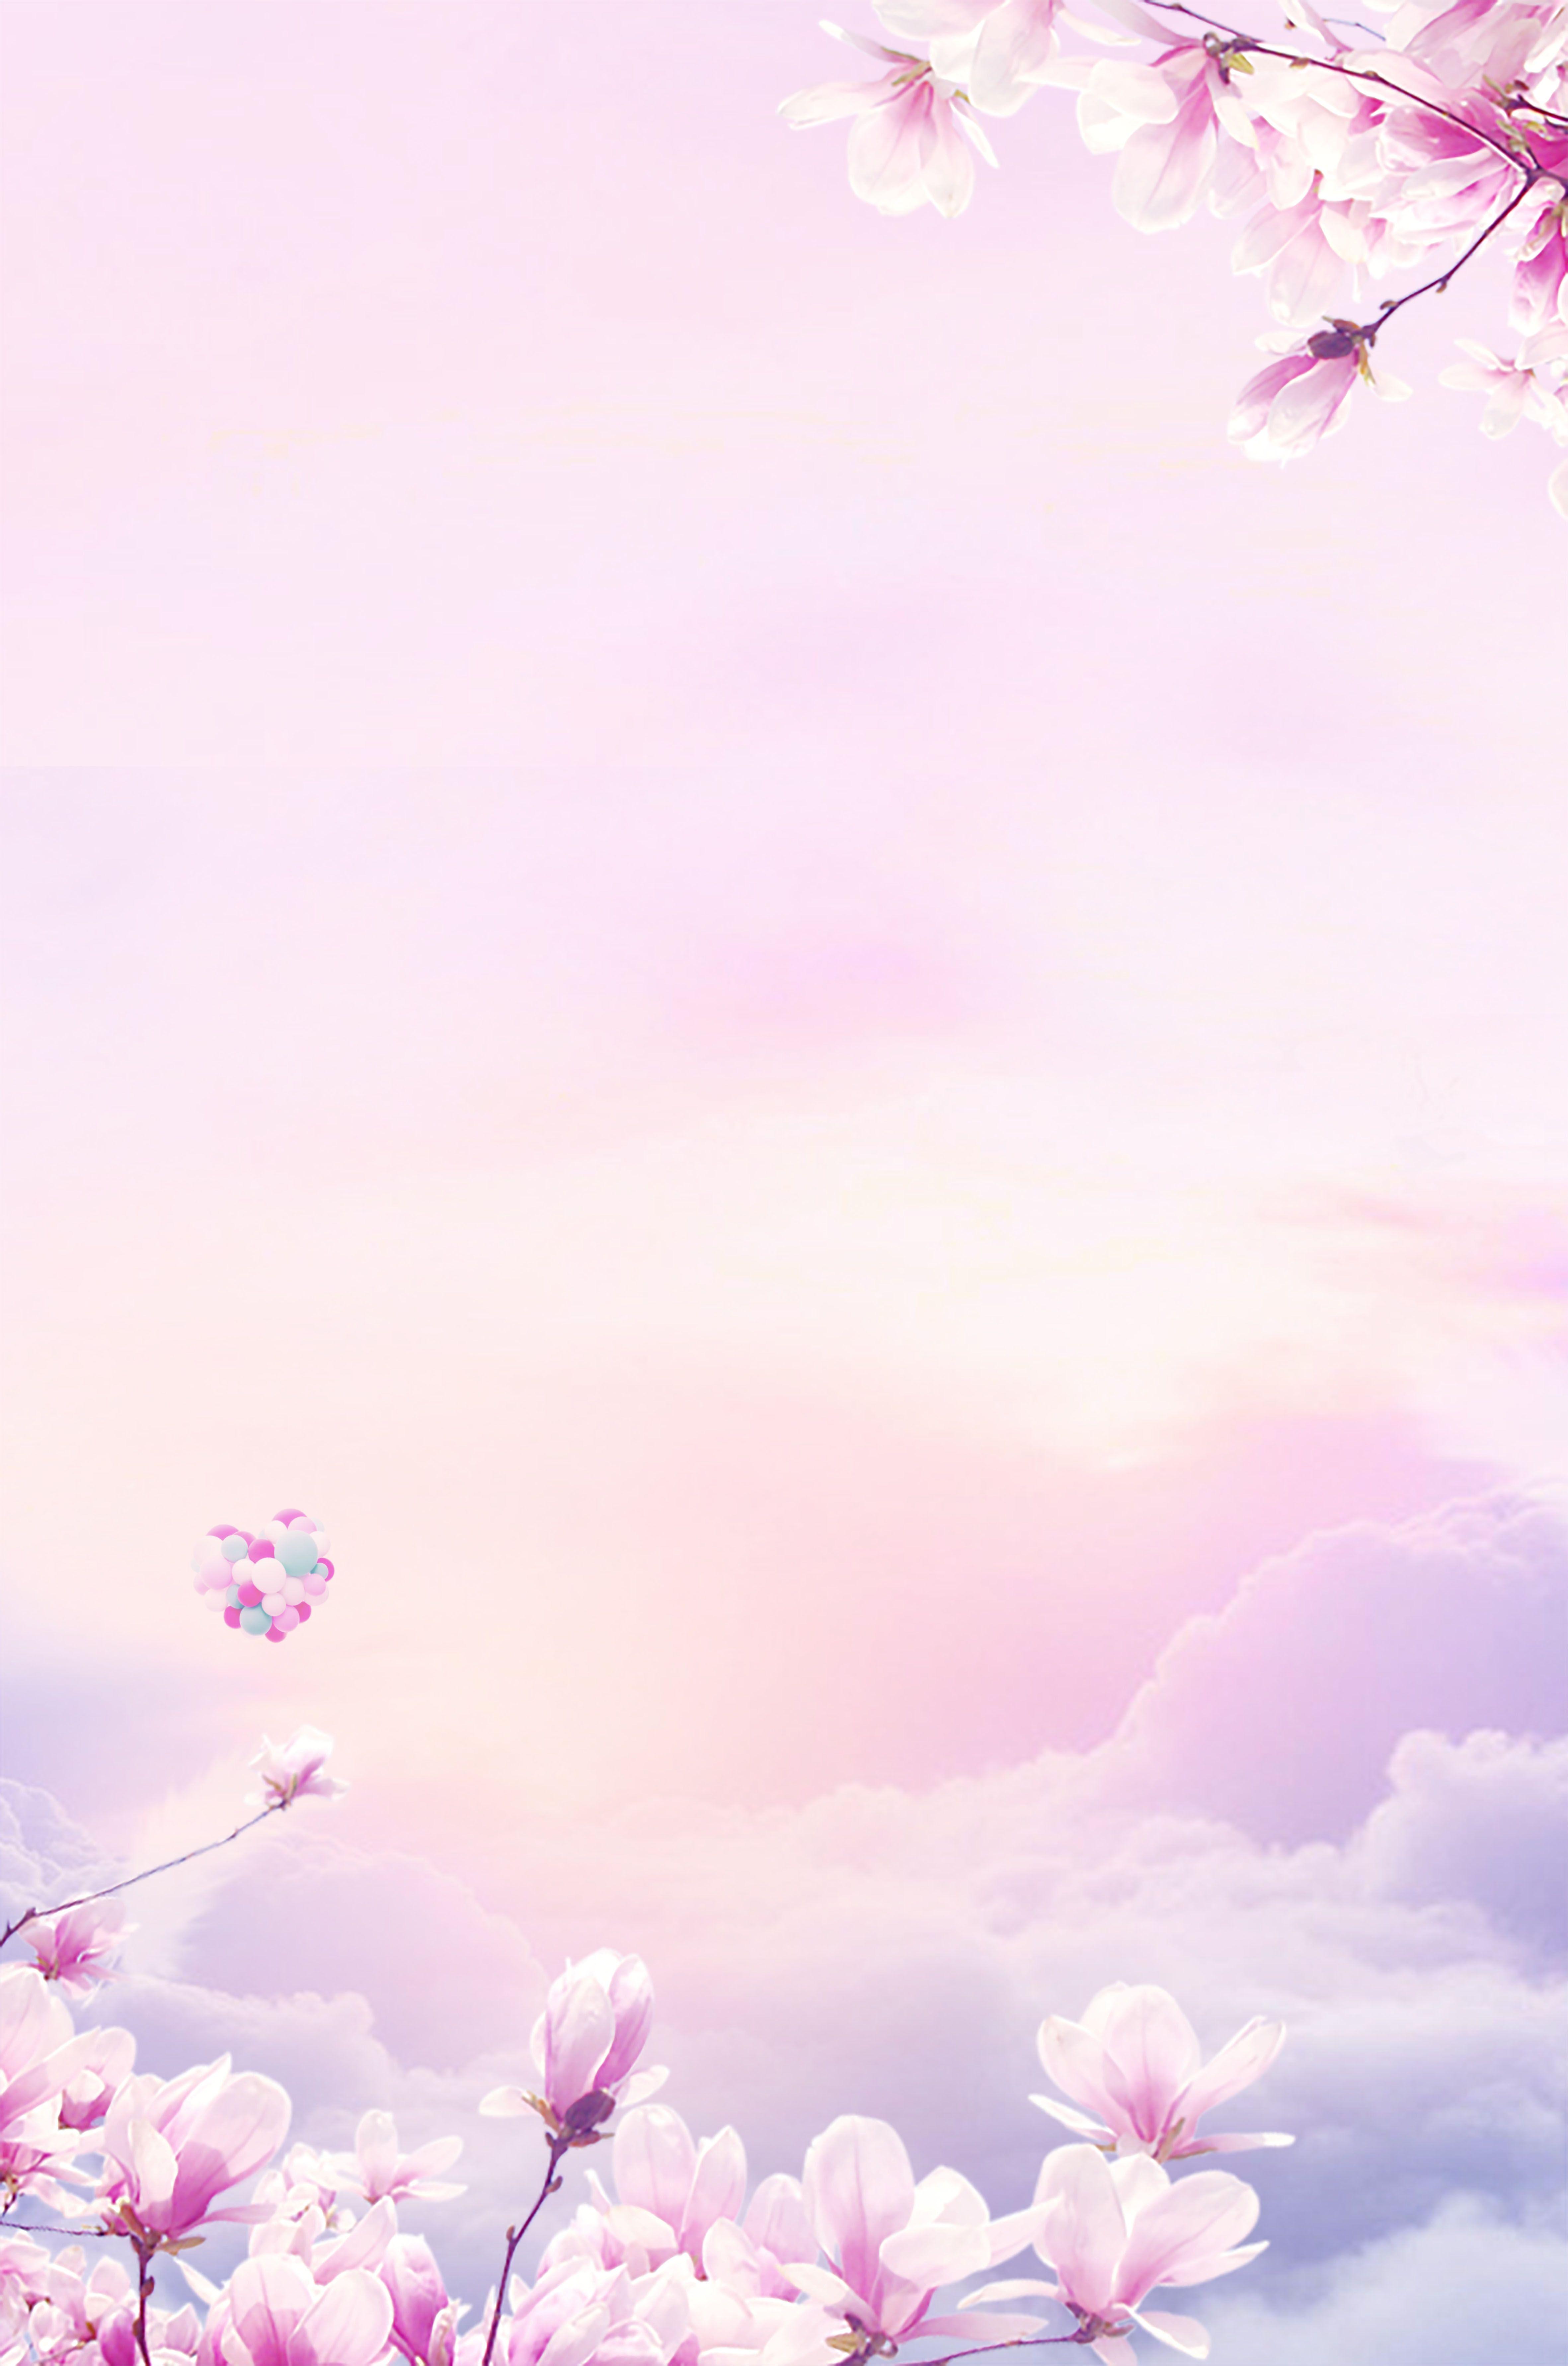 Sky Weather Clouds Cloudscape Background